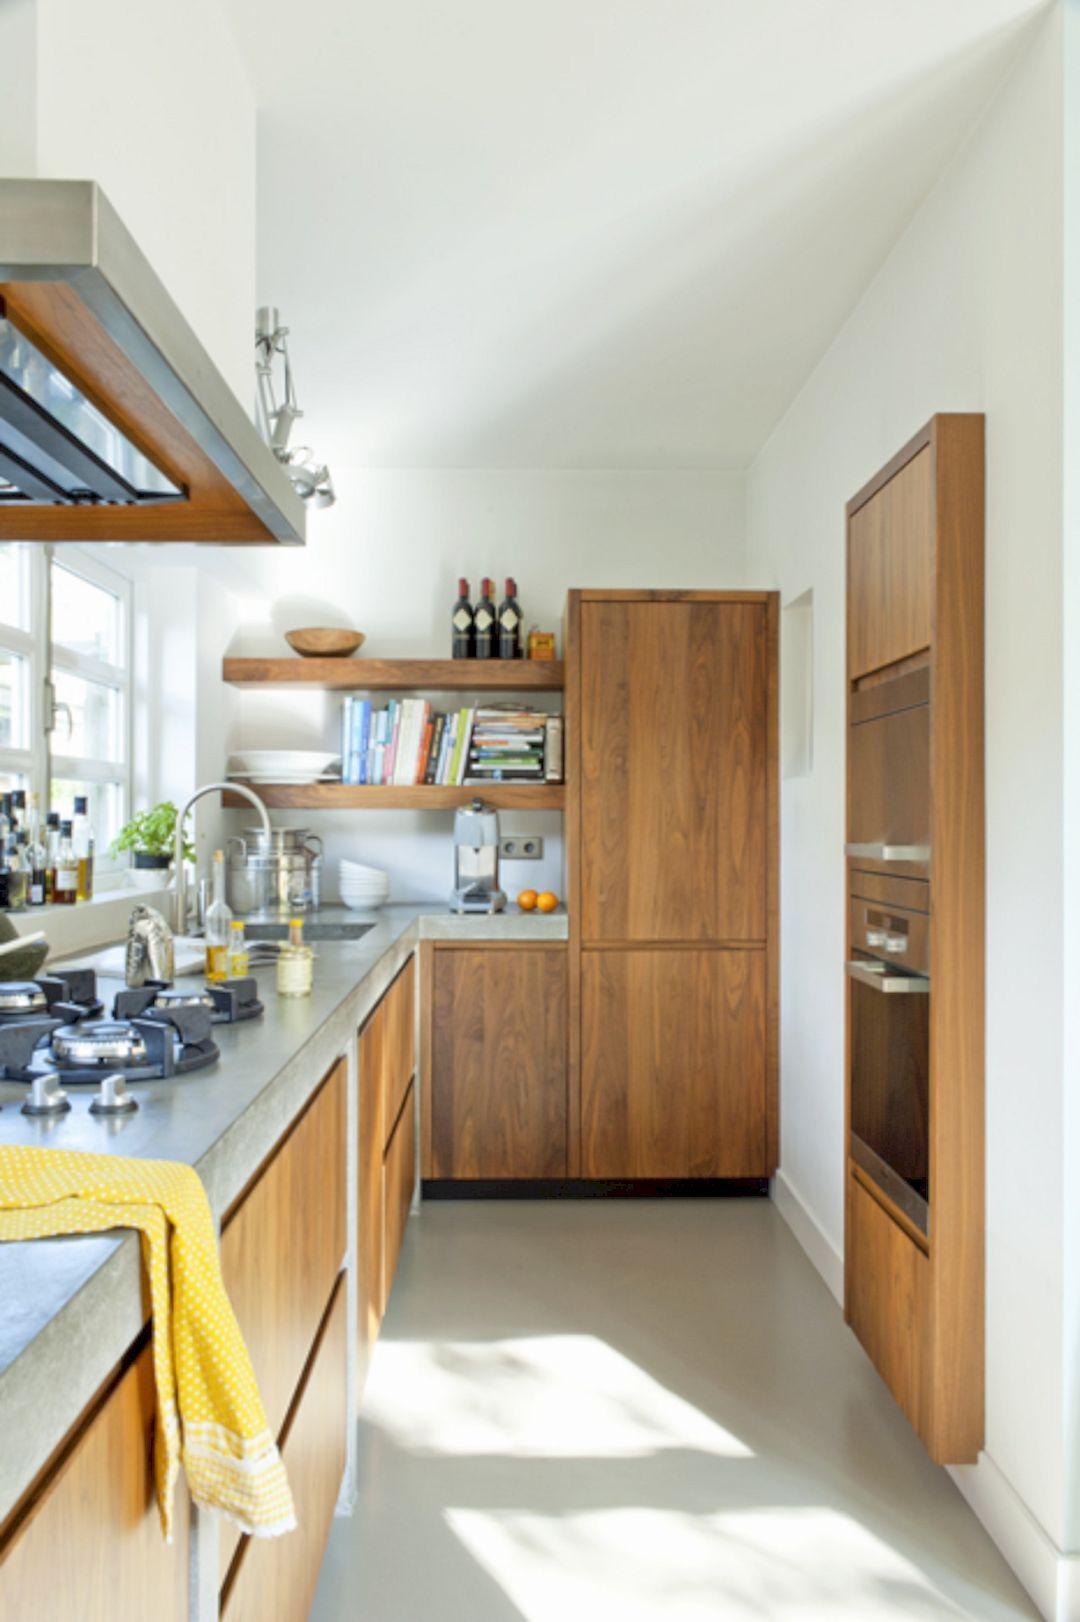 Kitchen Design Long Narrow Room: 5 Most Popular Kitchen Design Layouts Ideas